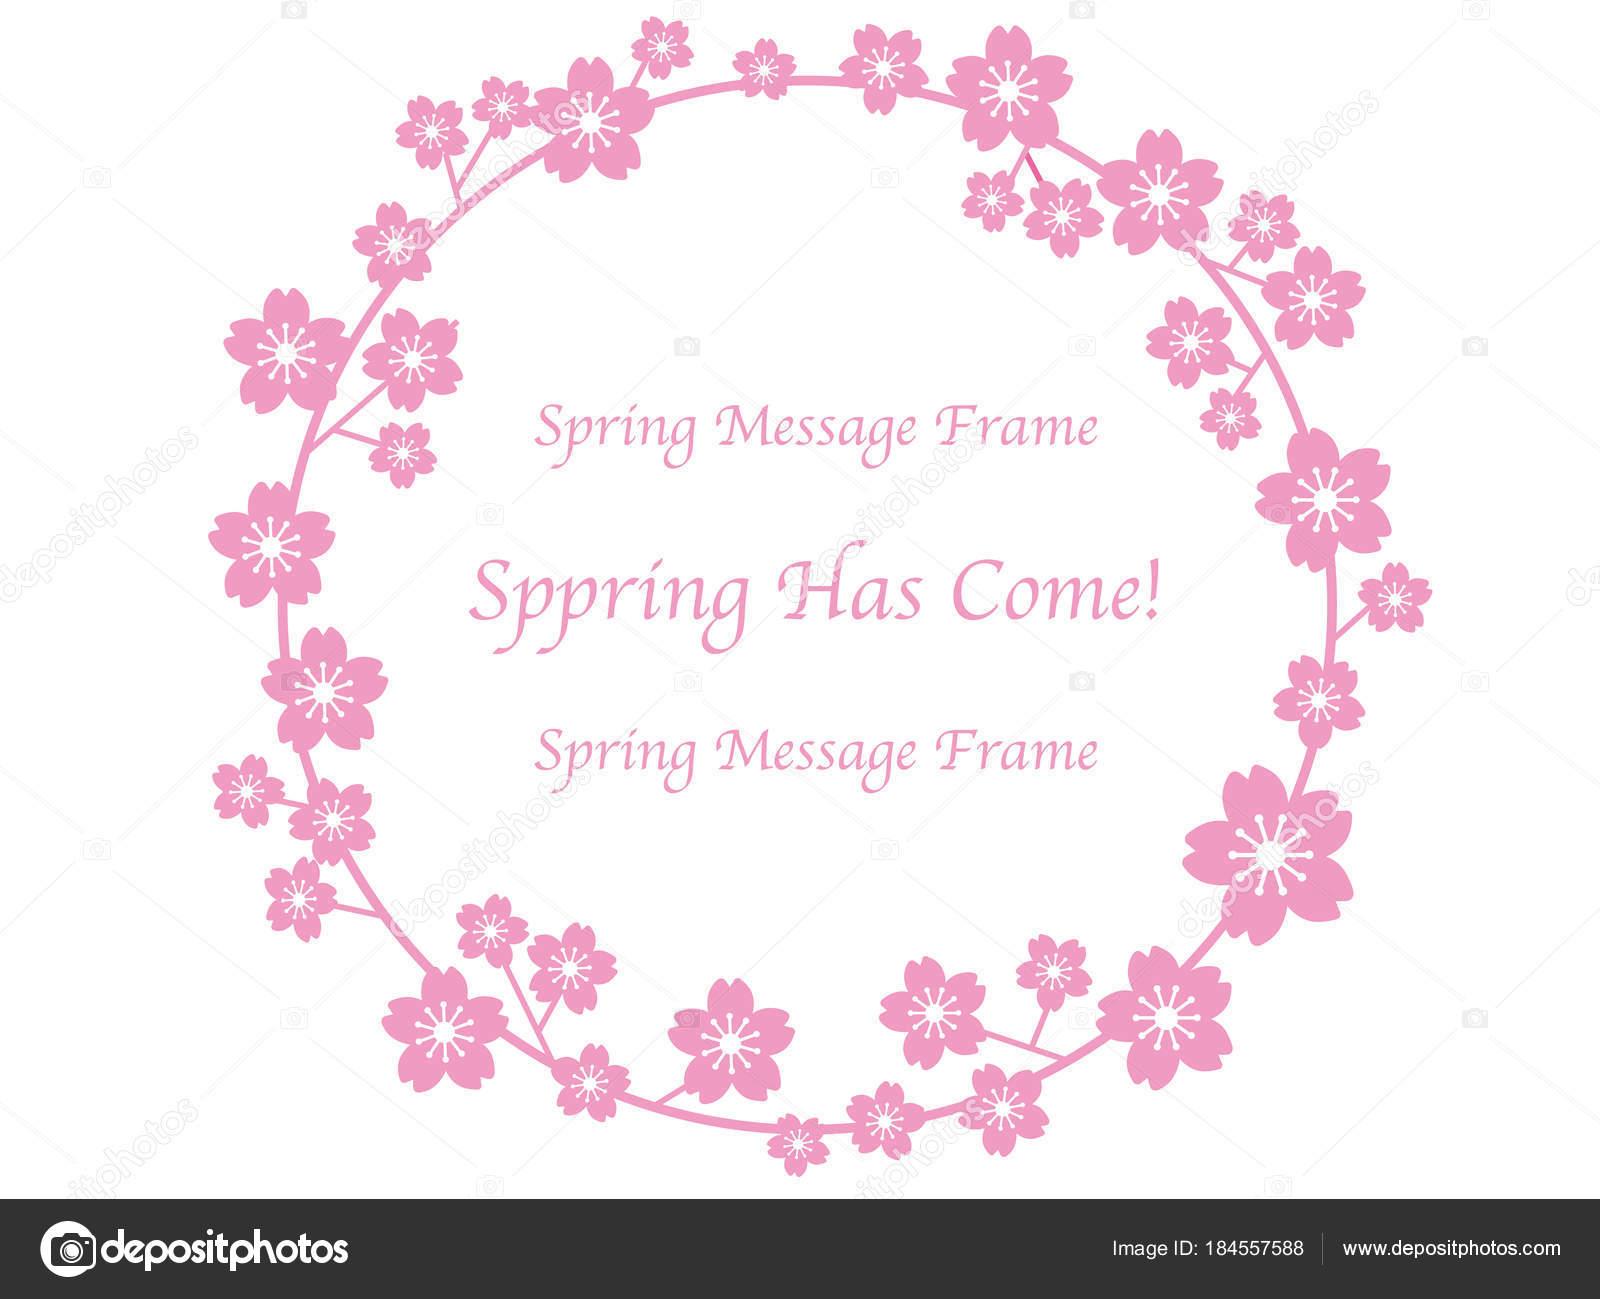 Vector Floral Wreath Cherry Blossom Flower Frame Greetings